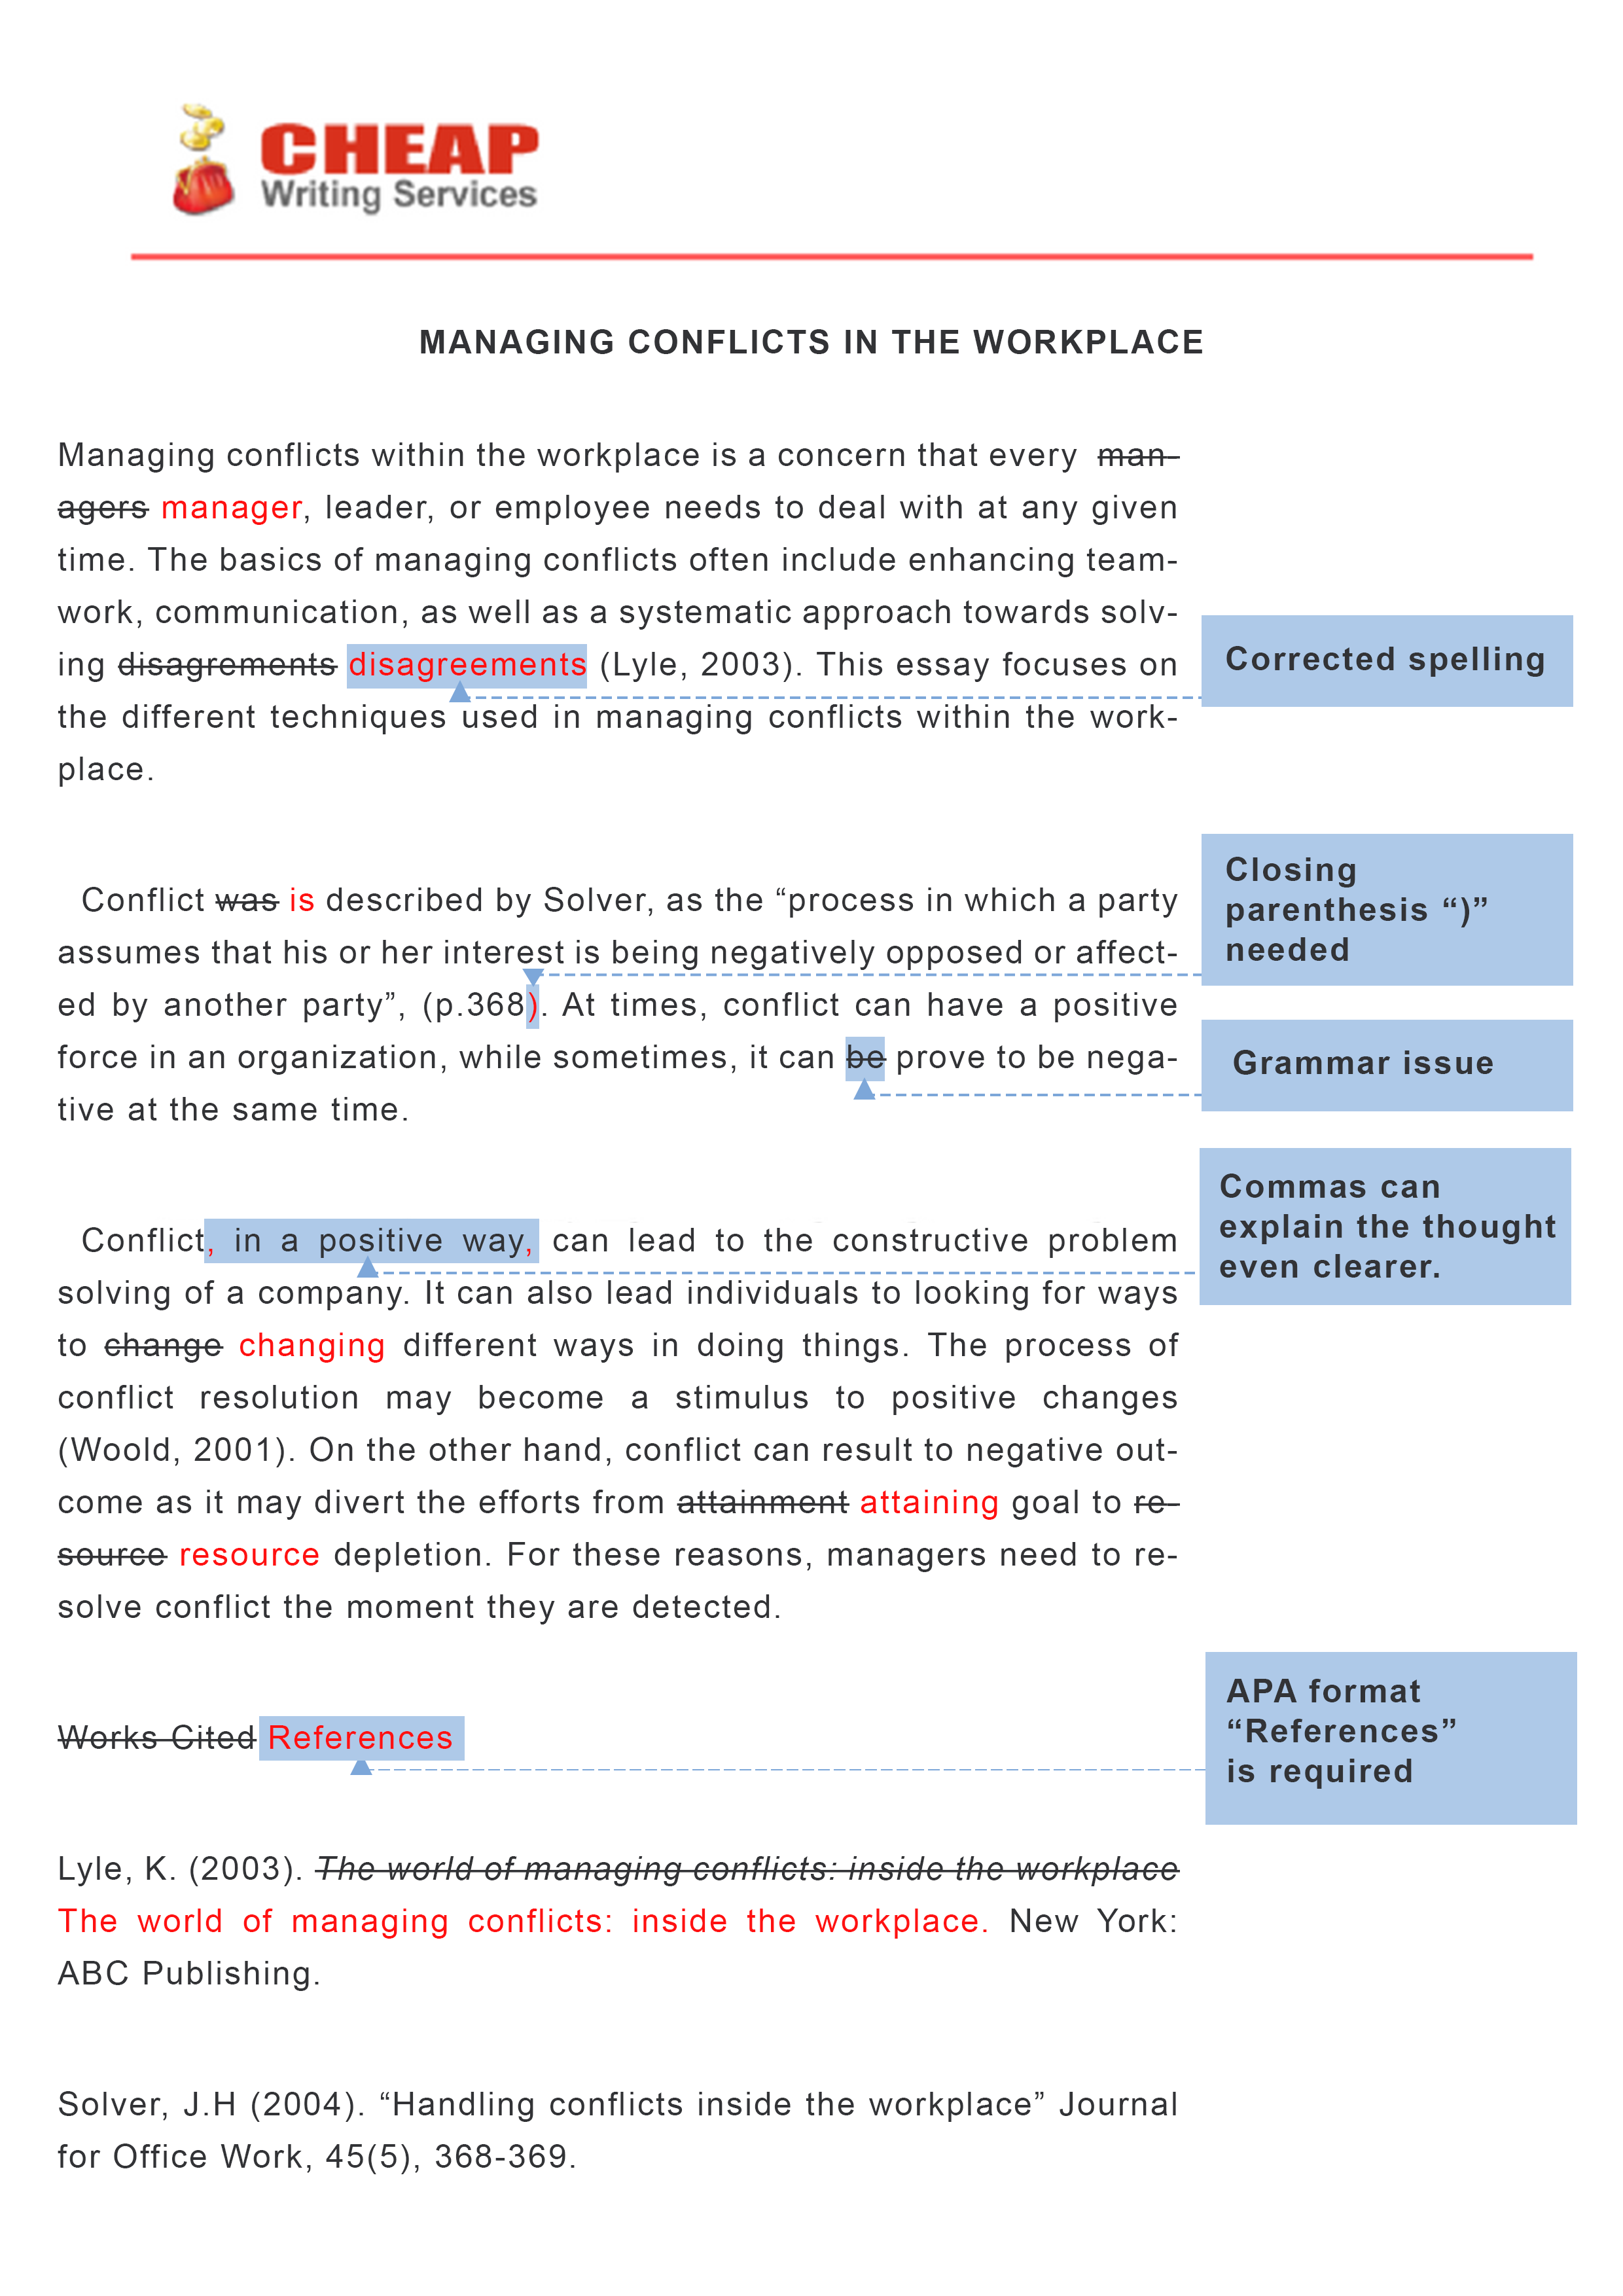 002 Essay Editing Example Cheap Beautiful Essays Quick Uk Paper Full